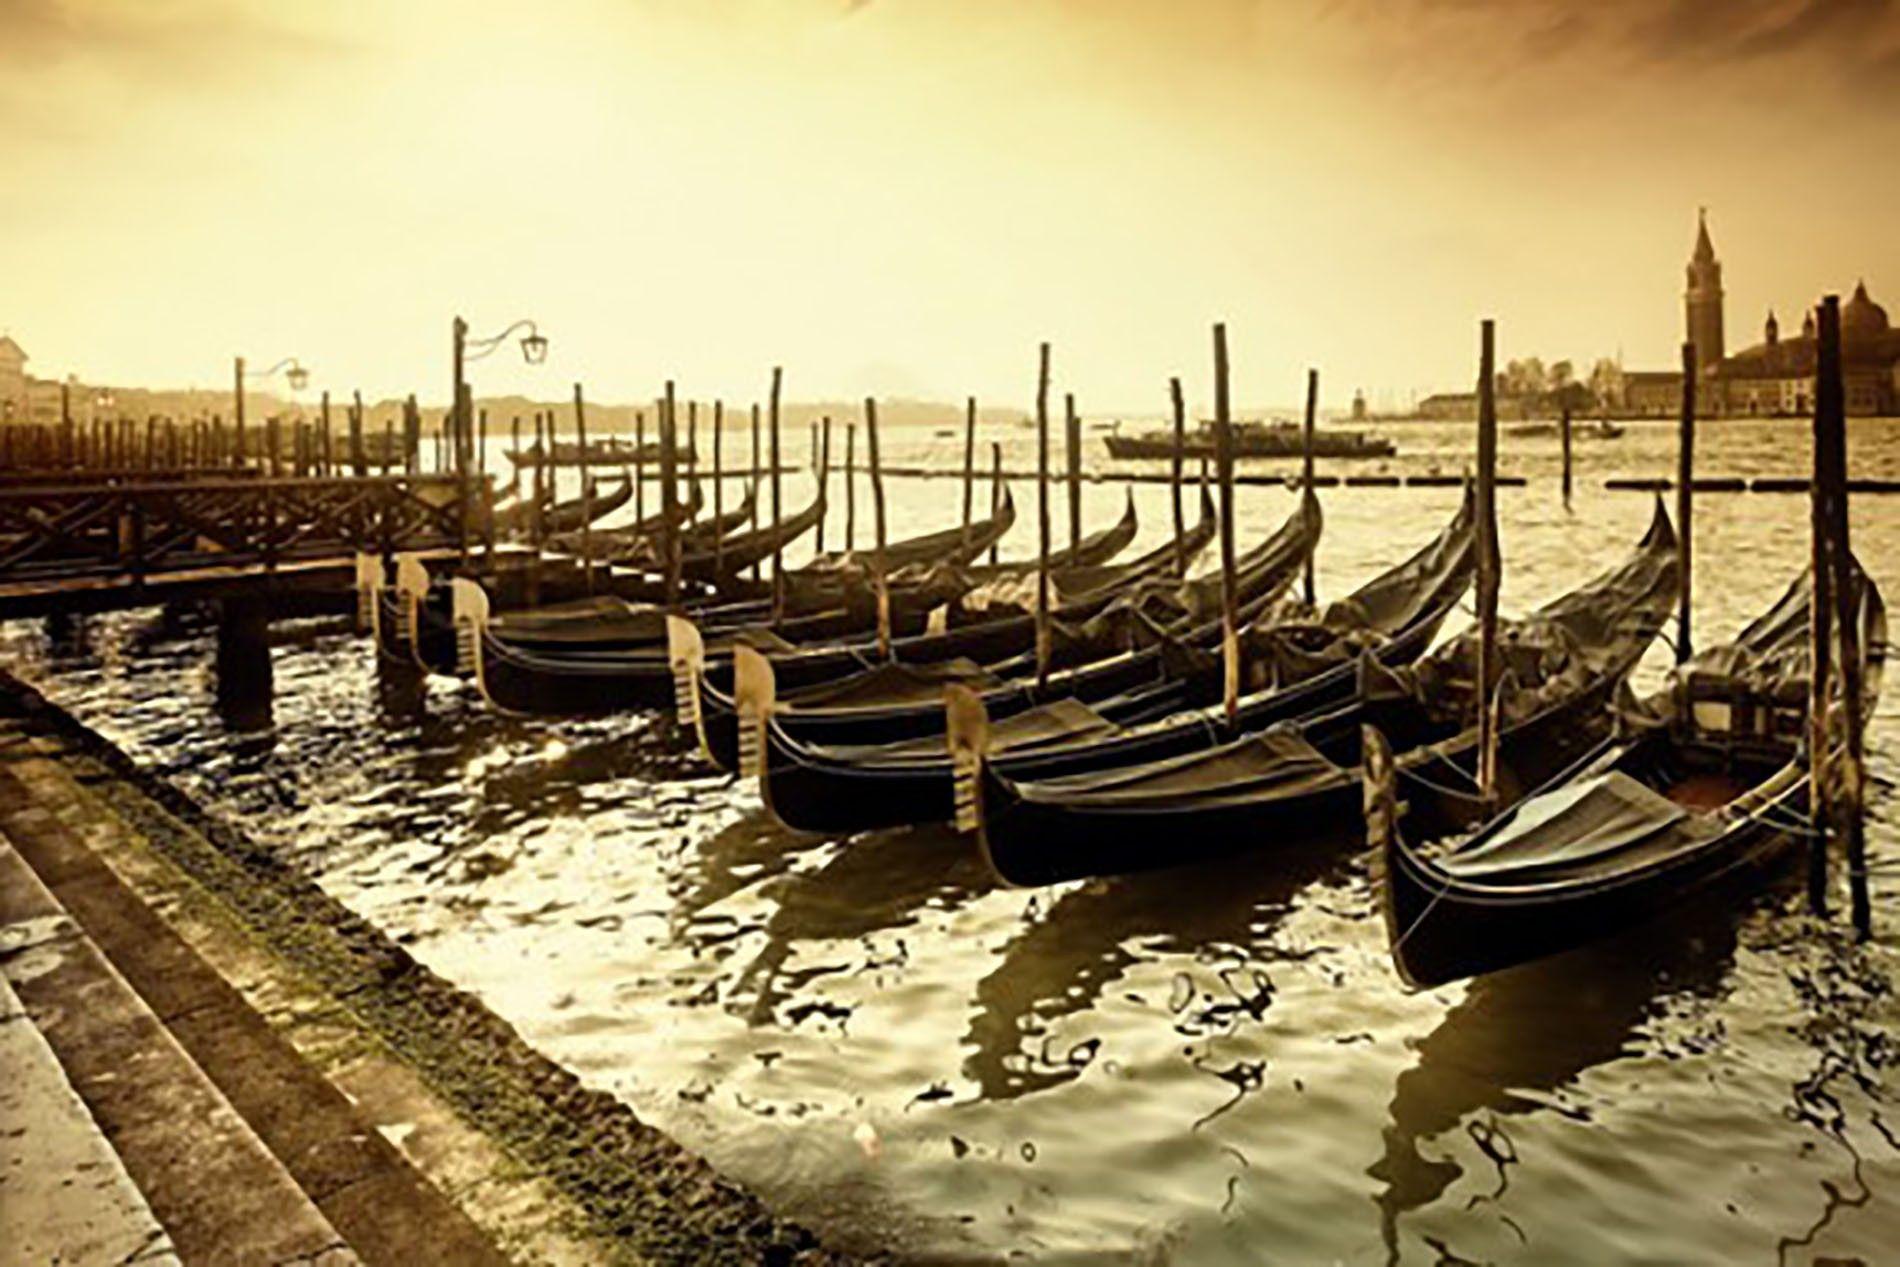 Venice: Faded grandeur